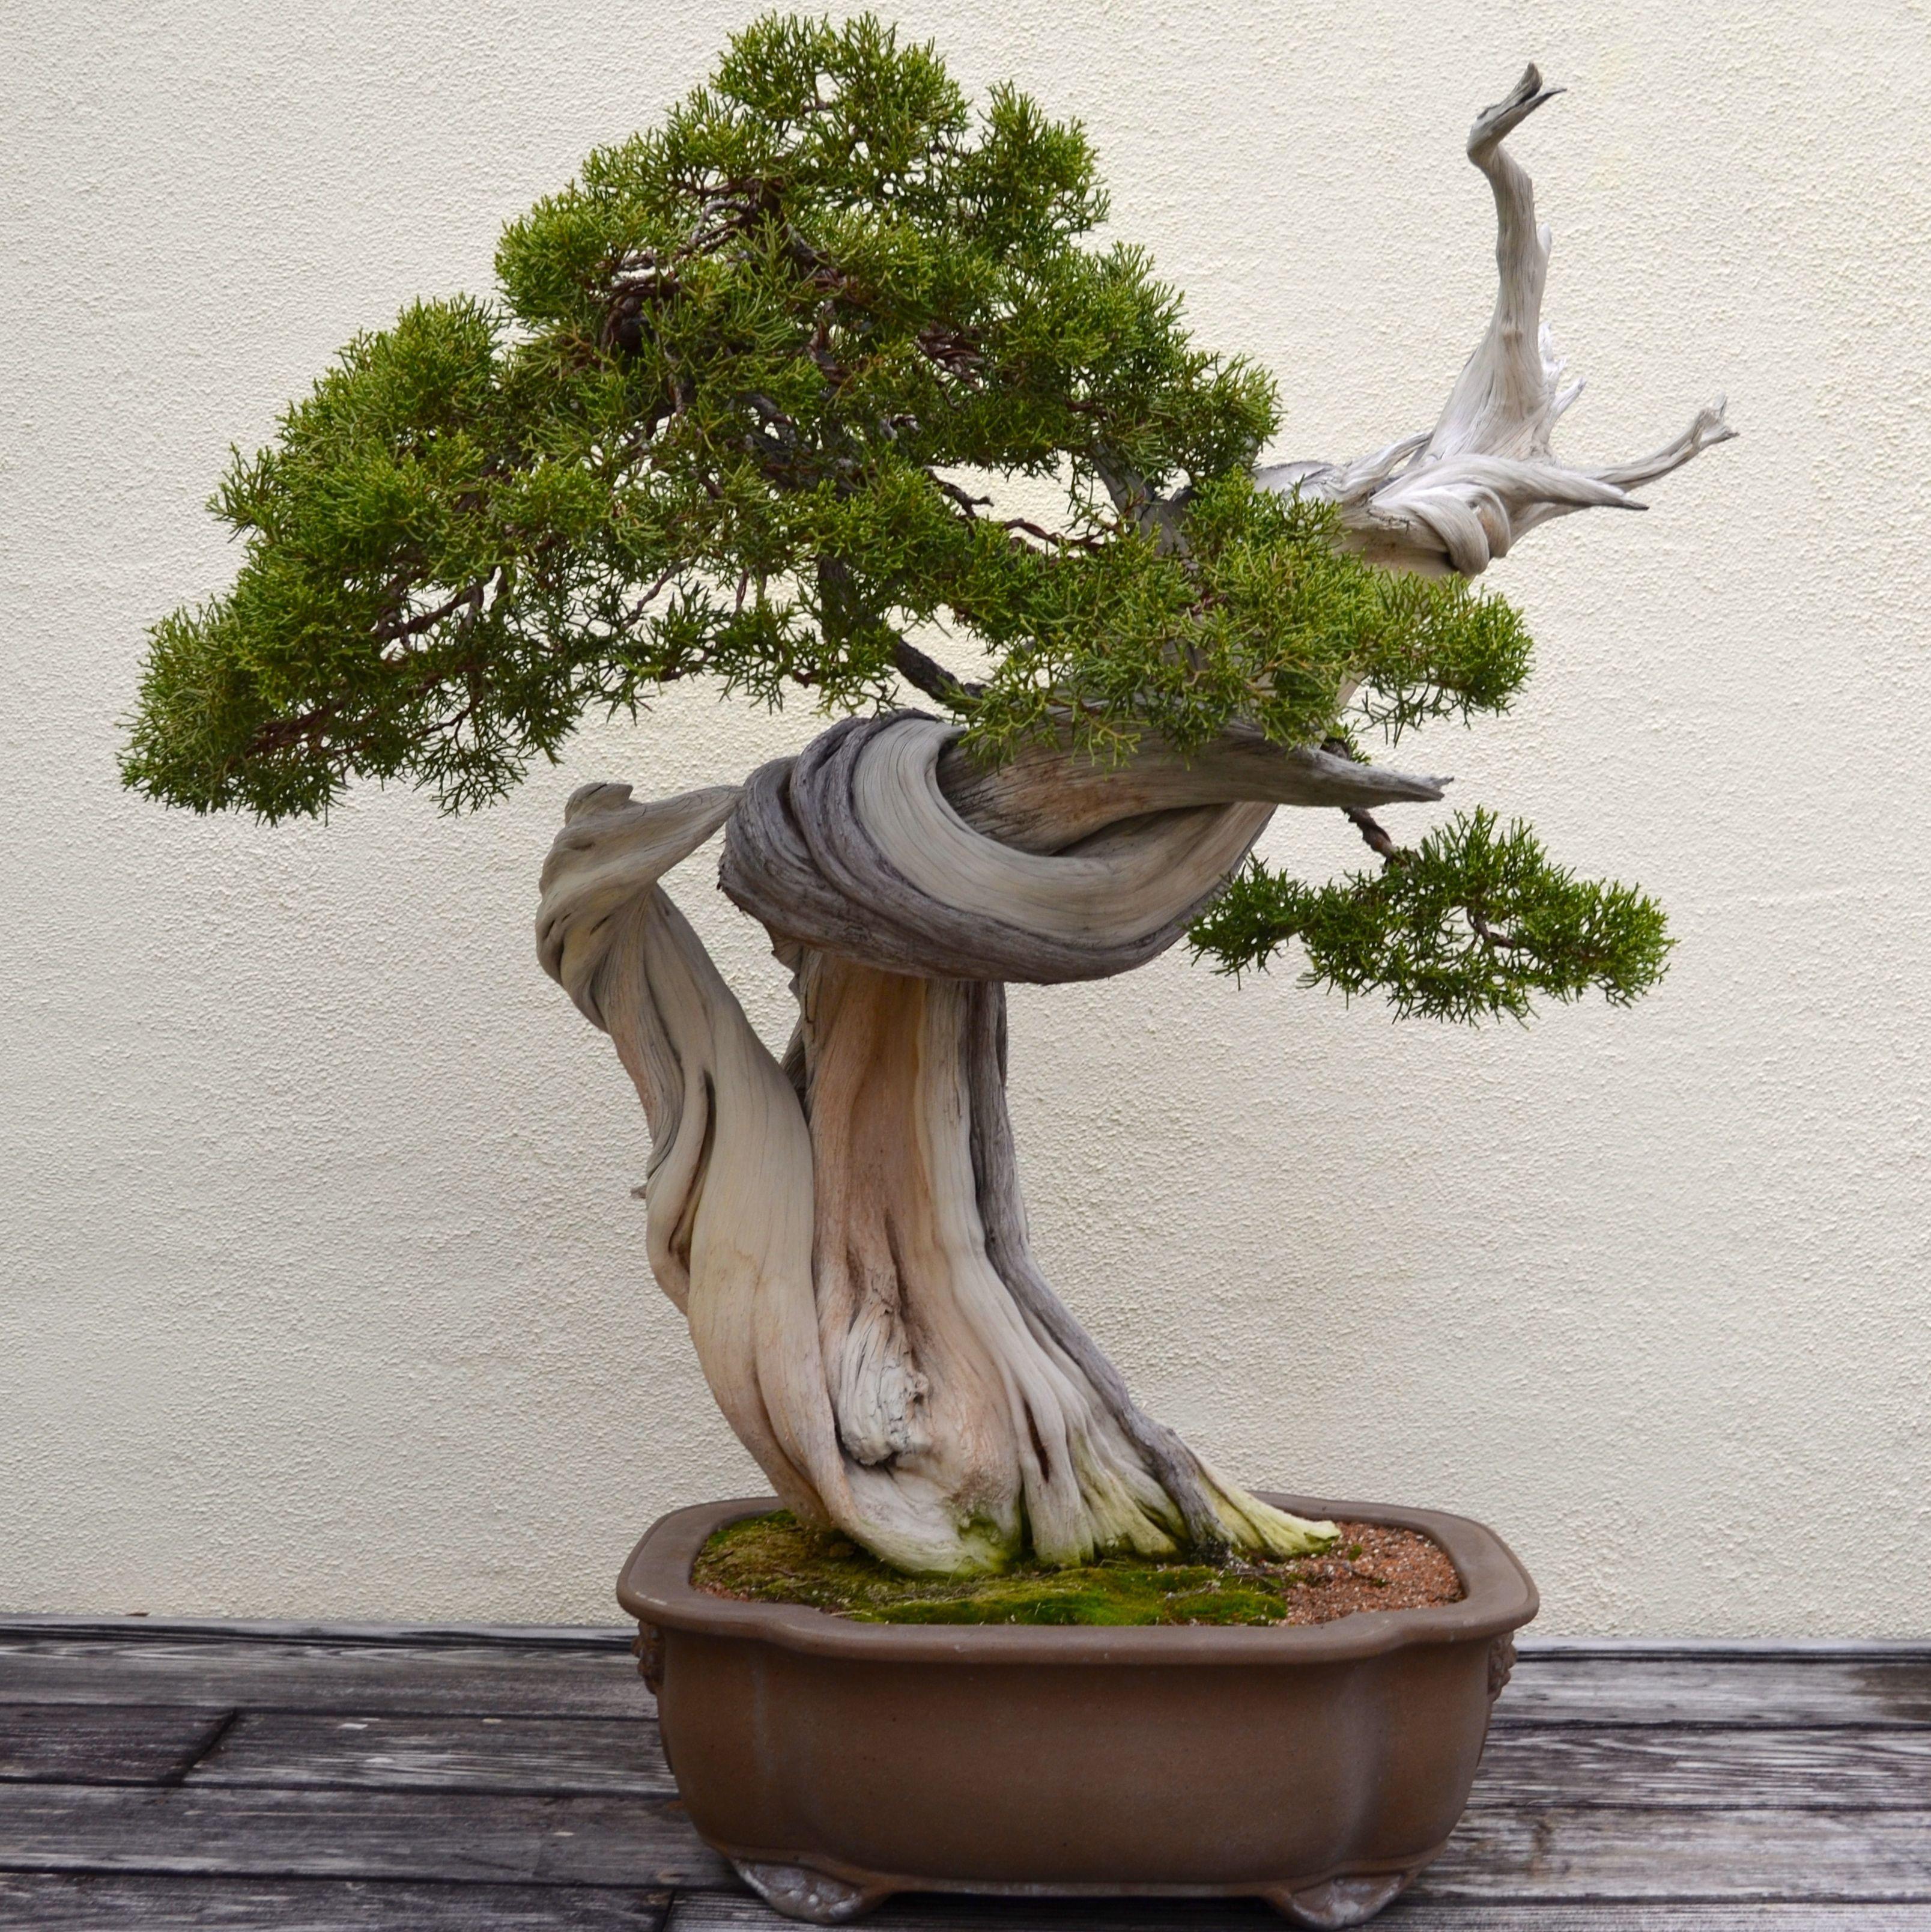 Creative Living Room with Bonsai Tree   Rememberingfallenjs.com